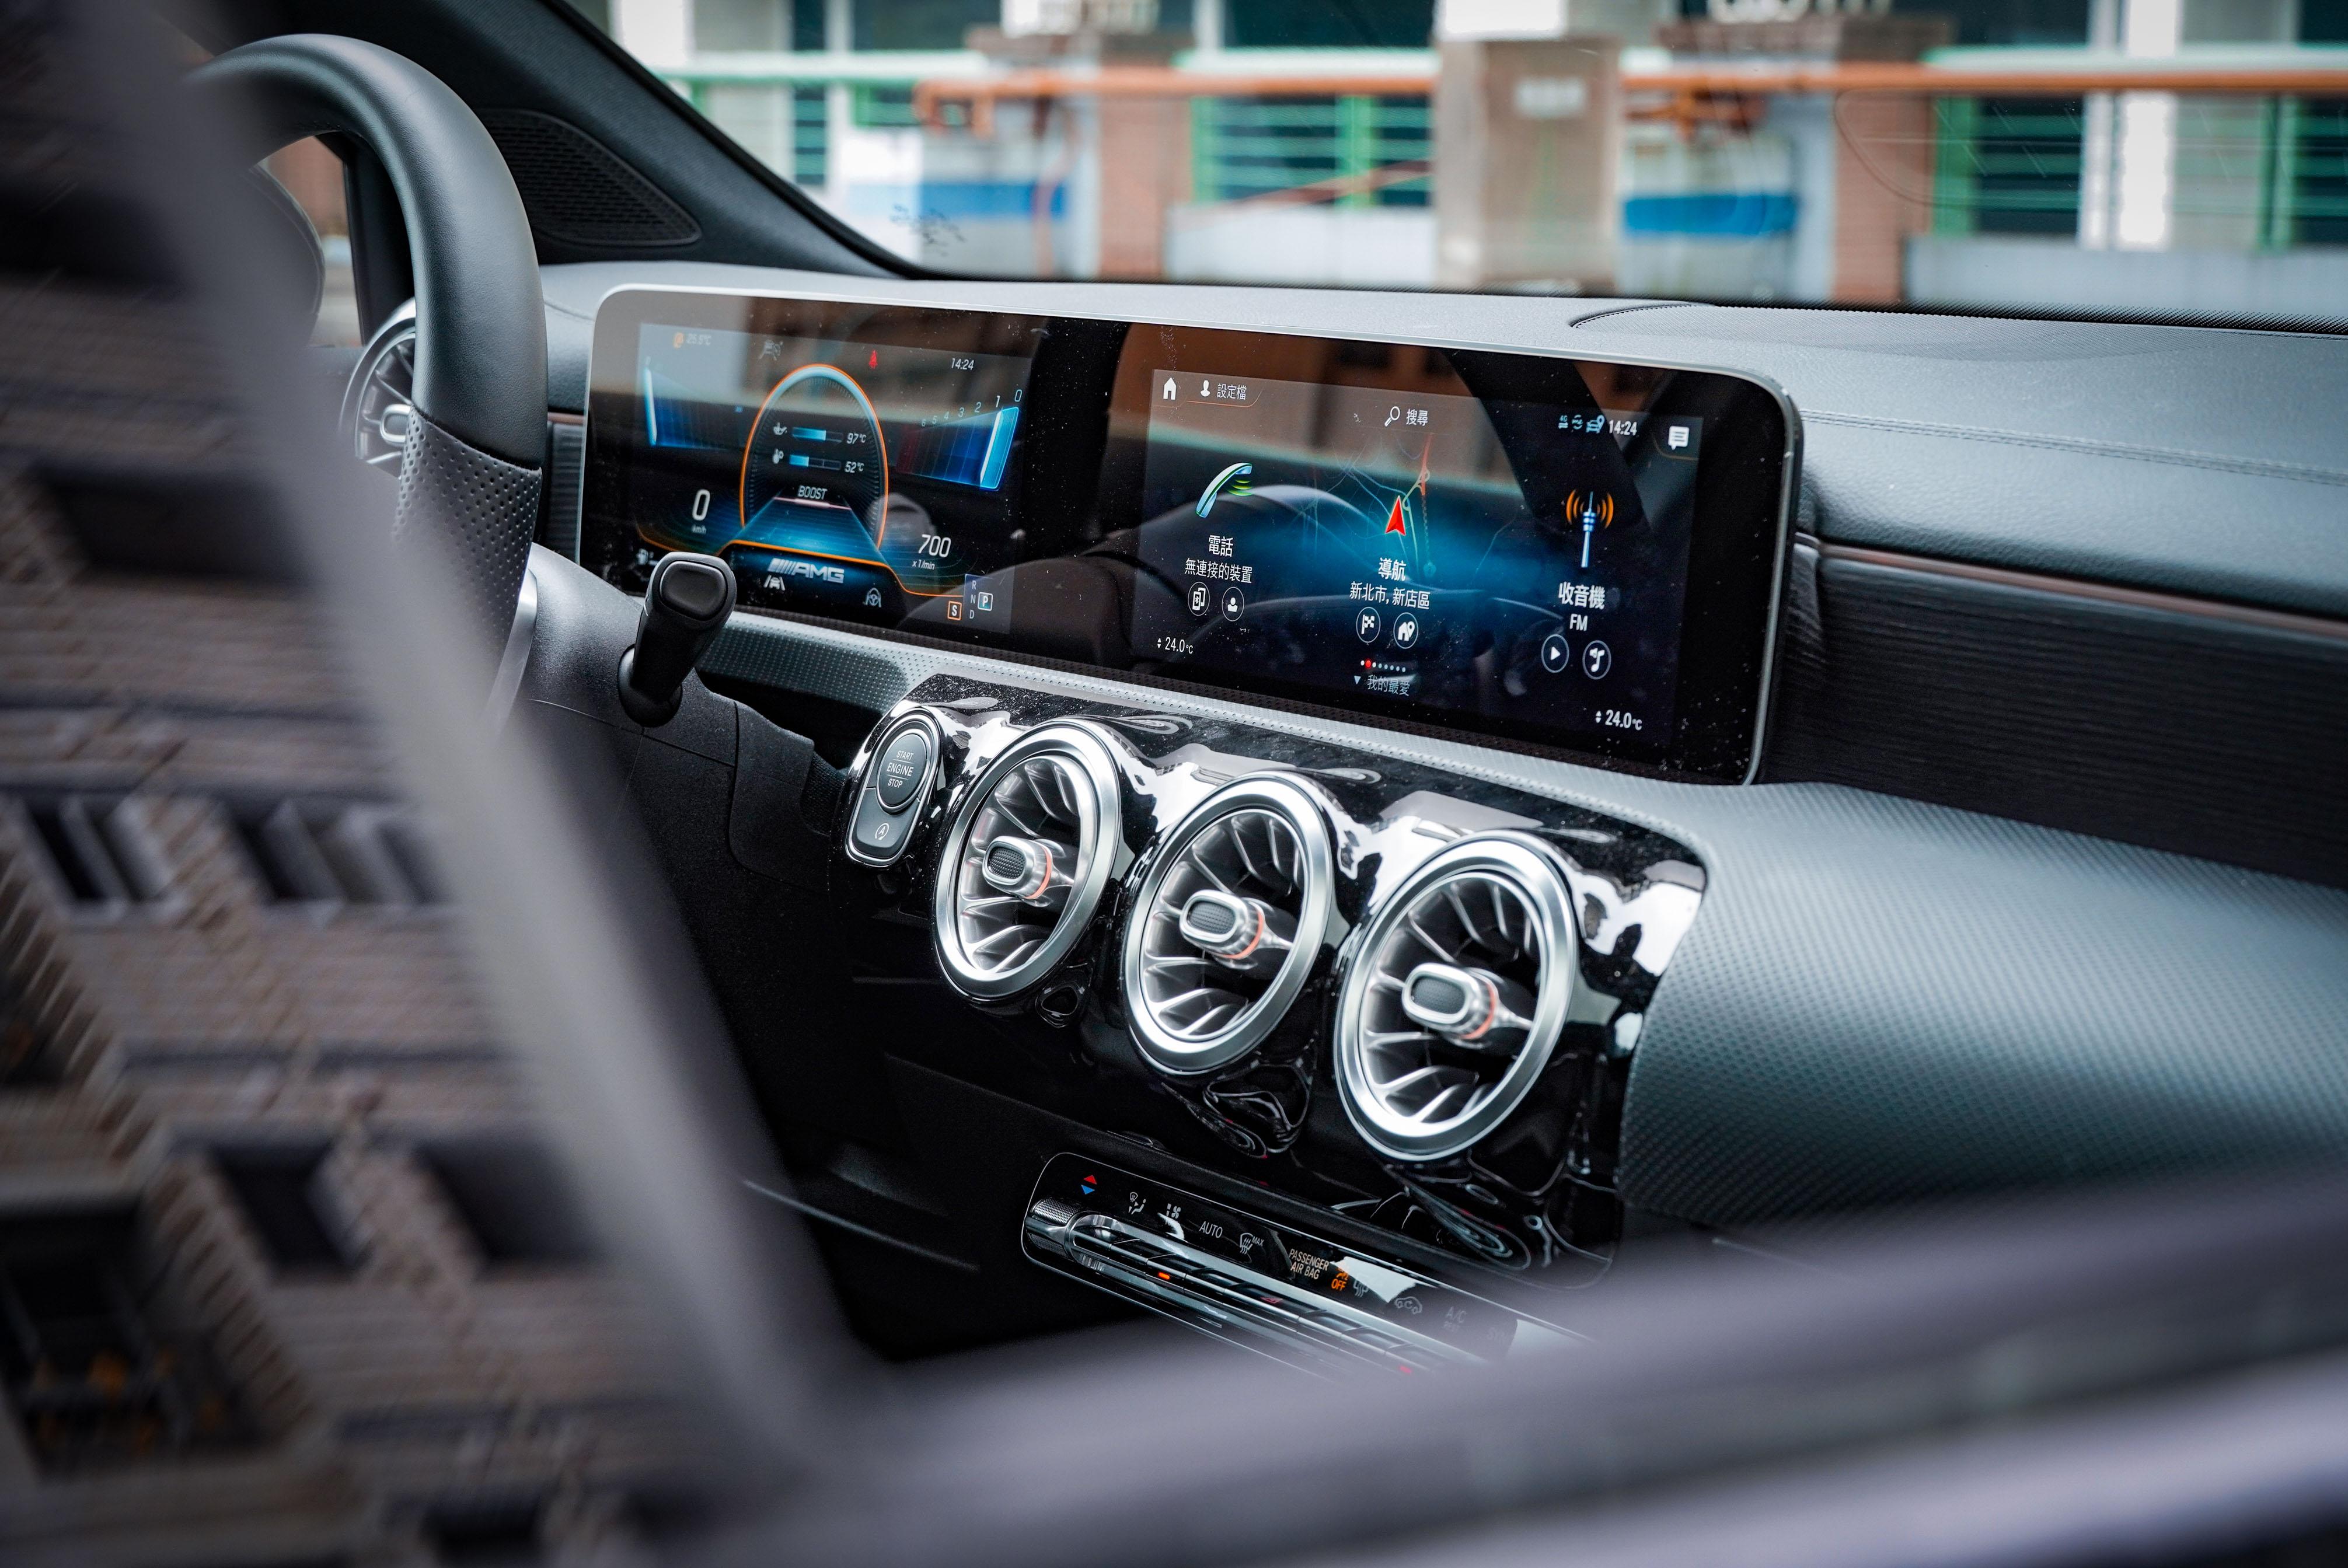 A 35 4MATIC 標配雙 10.25 吋數位儀表及觸控螢幕的進階 MBUX 多媒體系統。